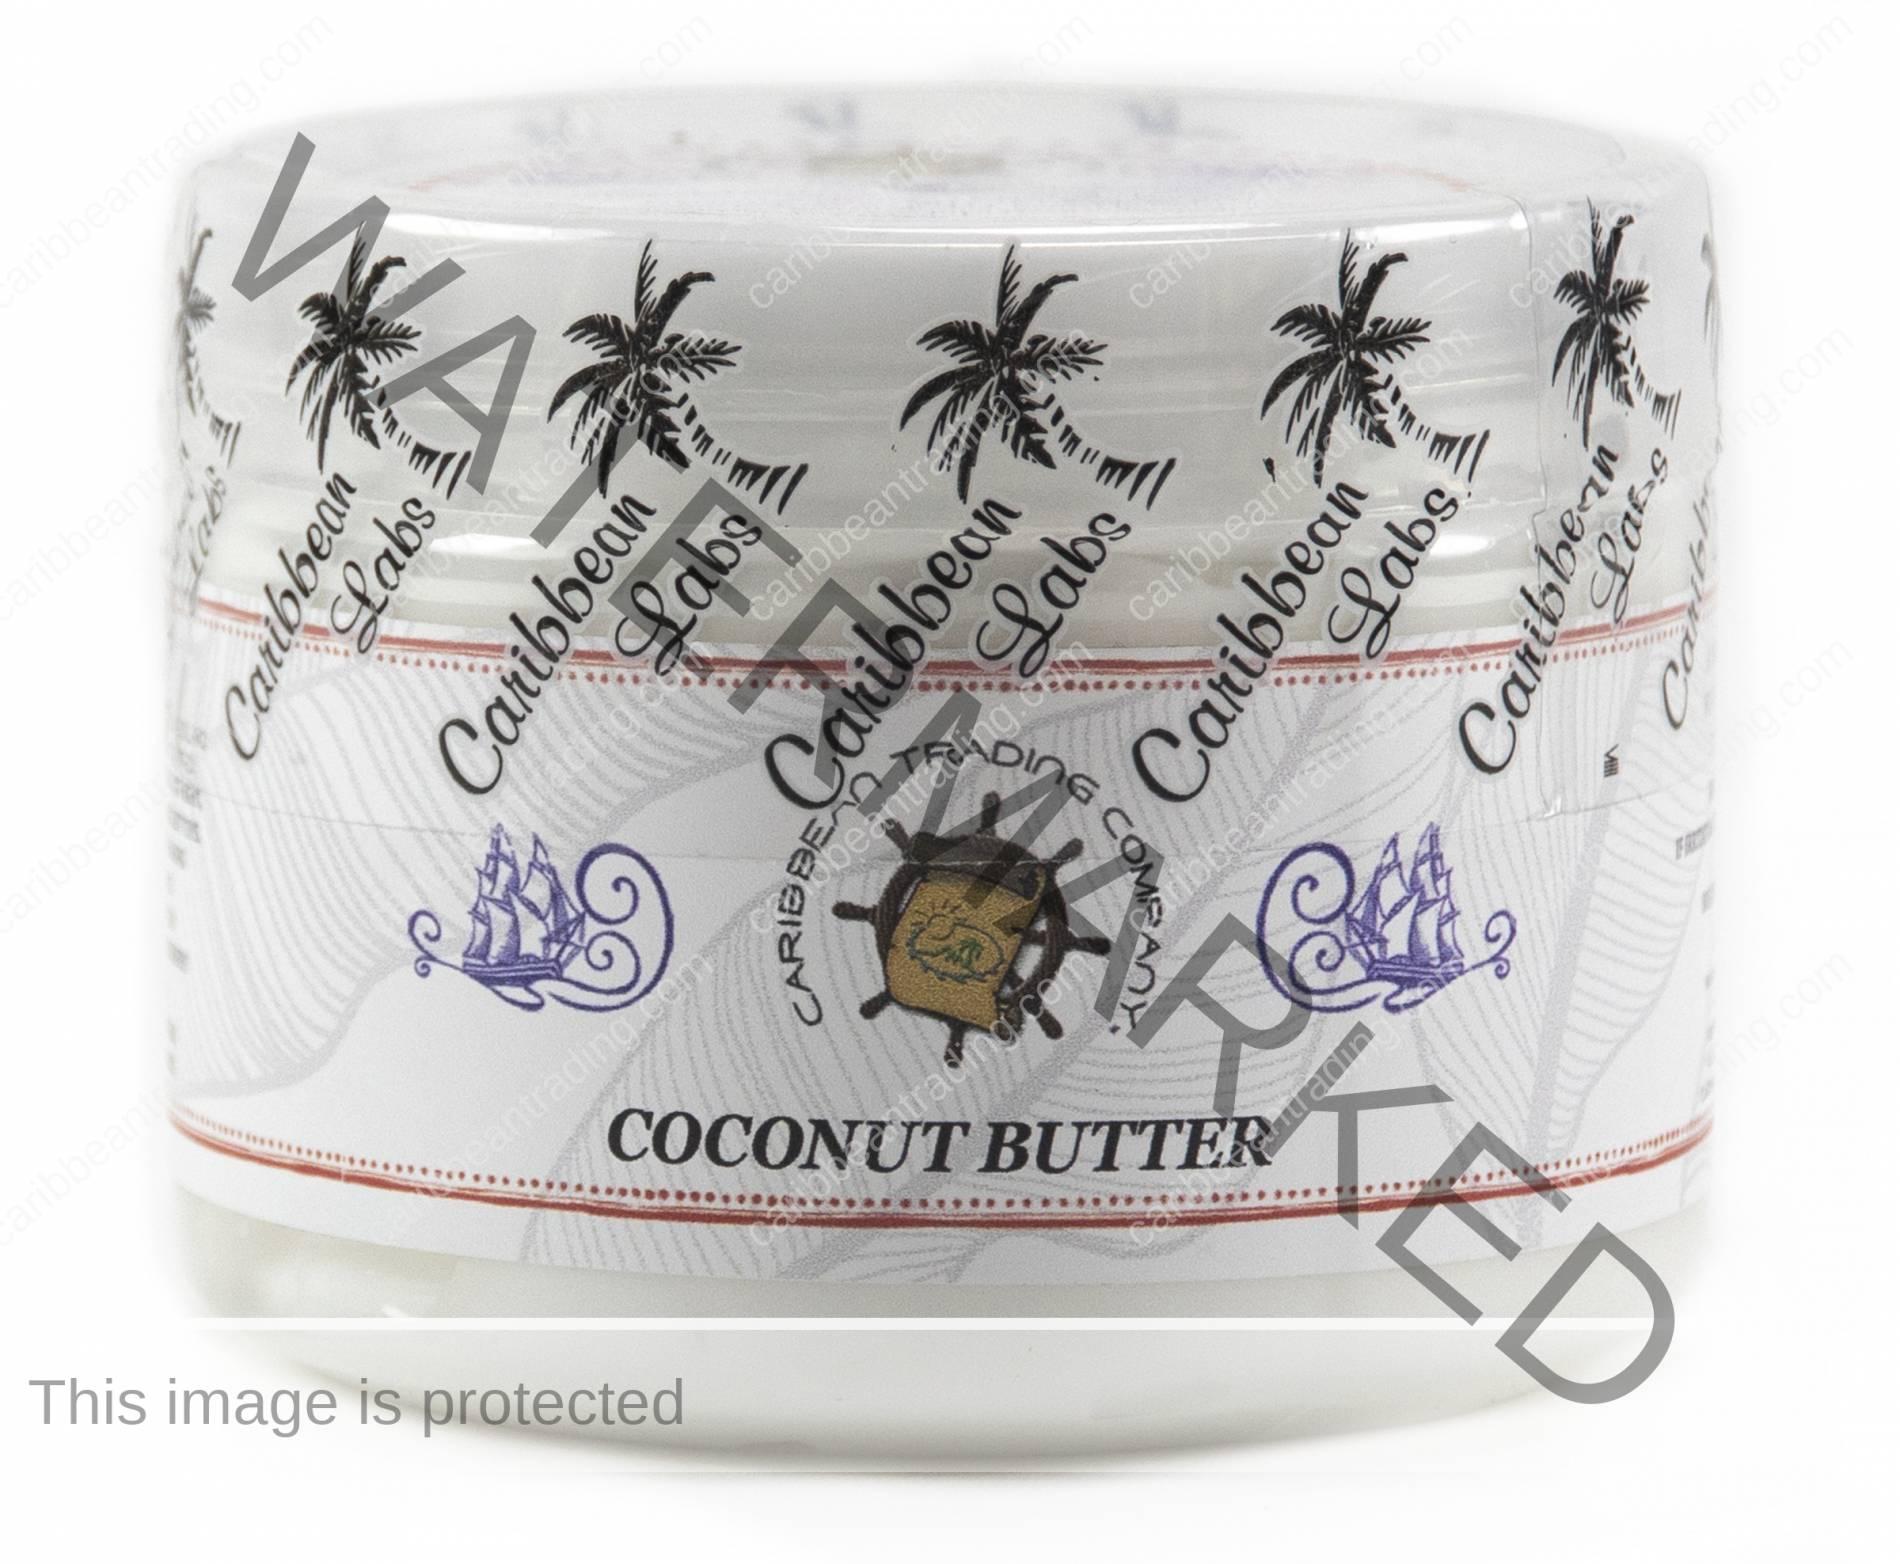 Coconut Body Butter 8 oz.